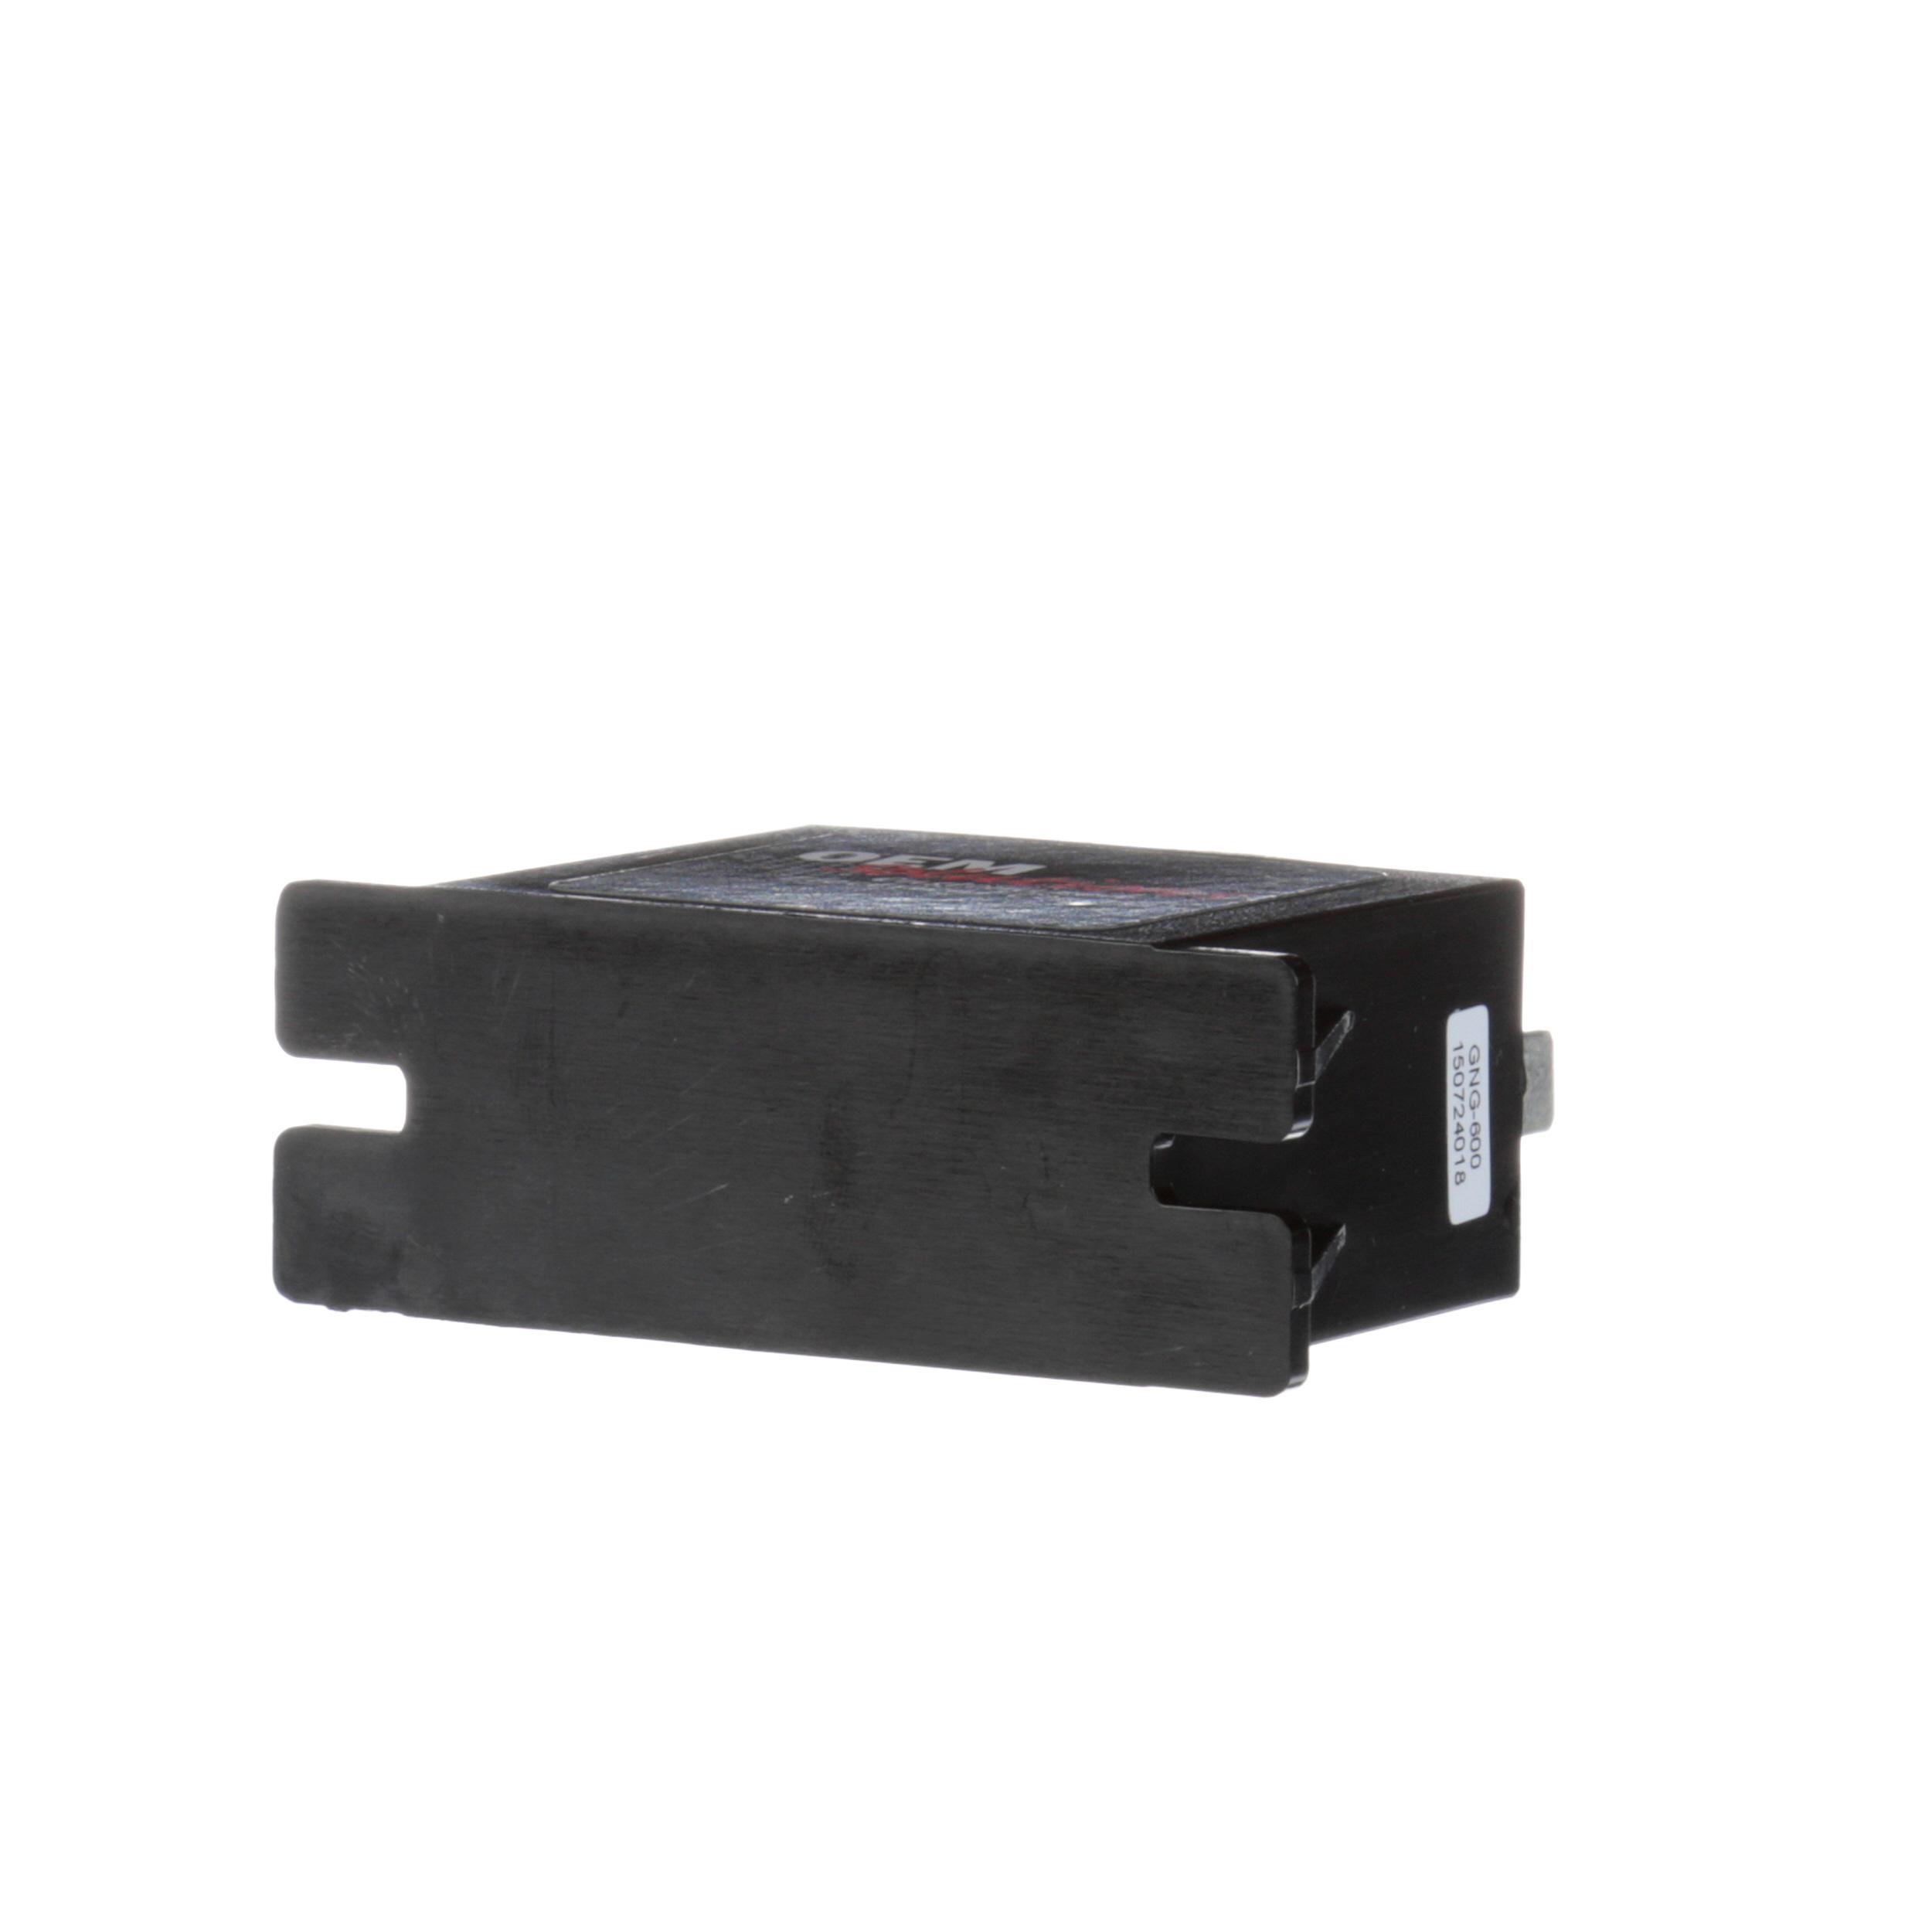 Master Bilt Relay Current Sensing Gng 6 Part 19 13750 Circuit